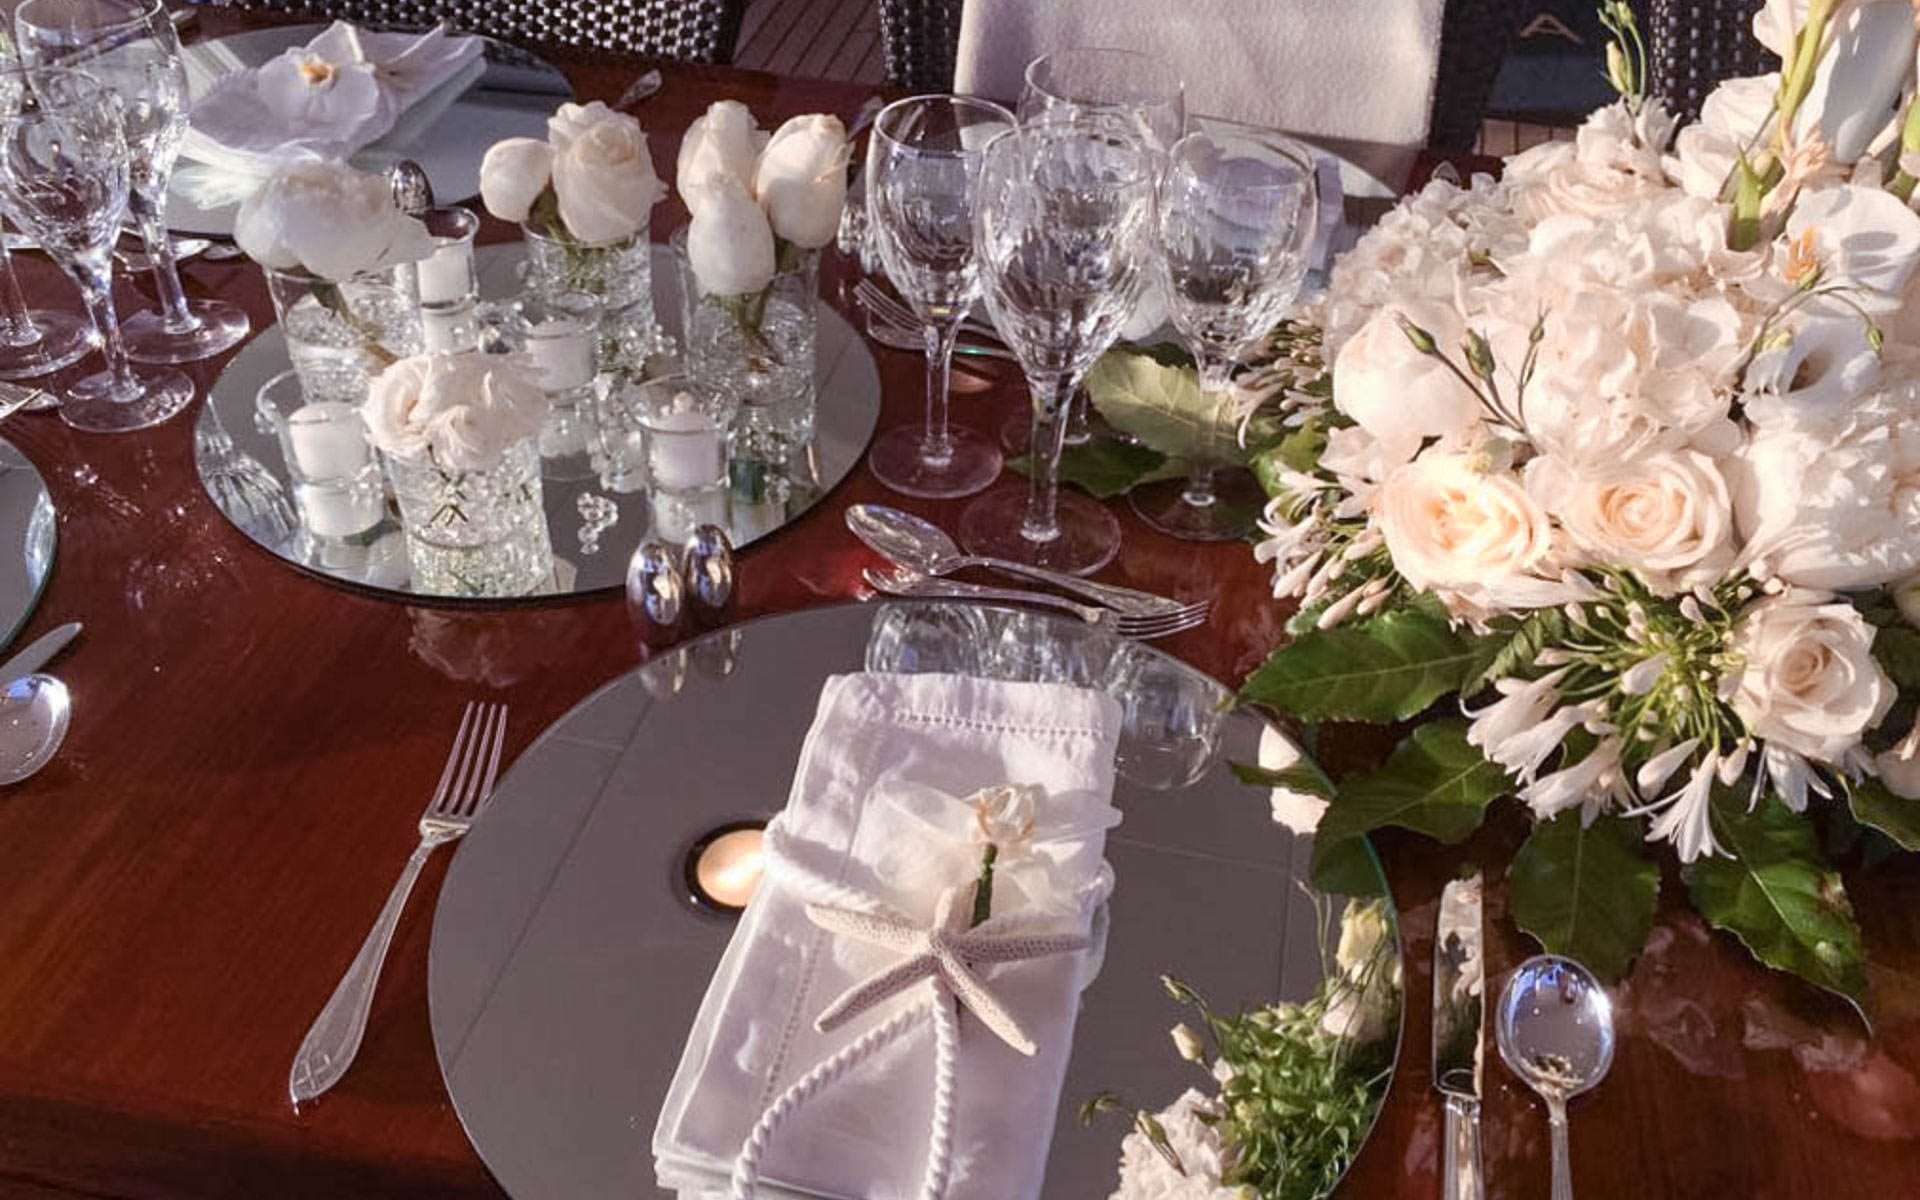 White House Events - White House Events - tavola fiori-13